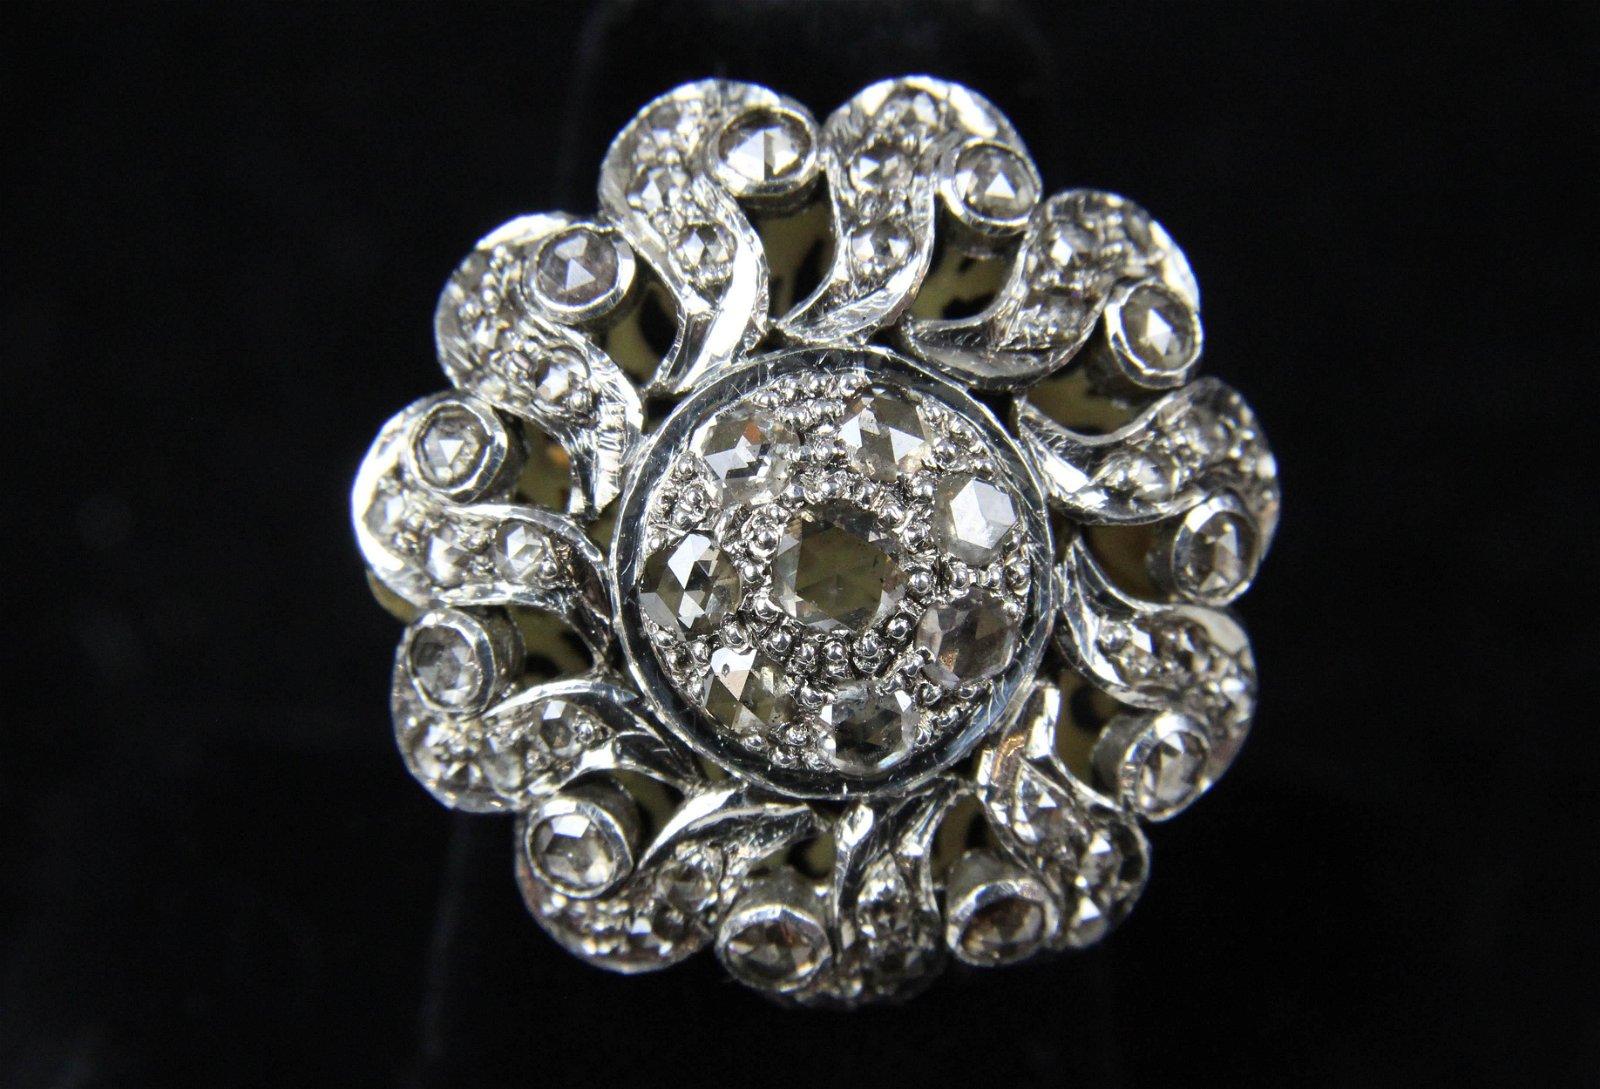 Late 18th c rose cut diamond ring